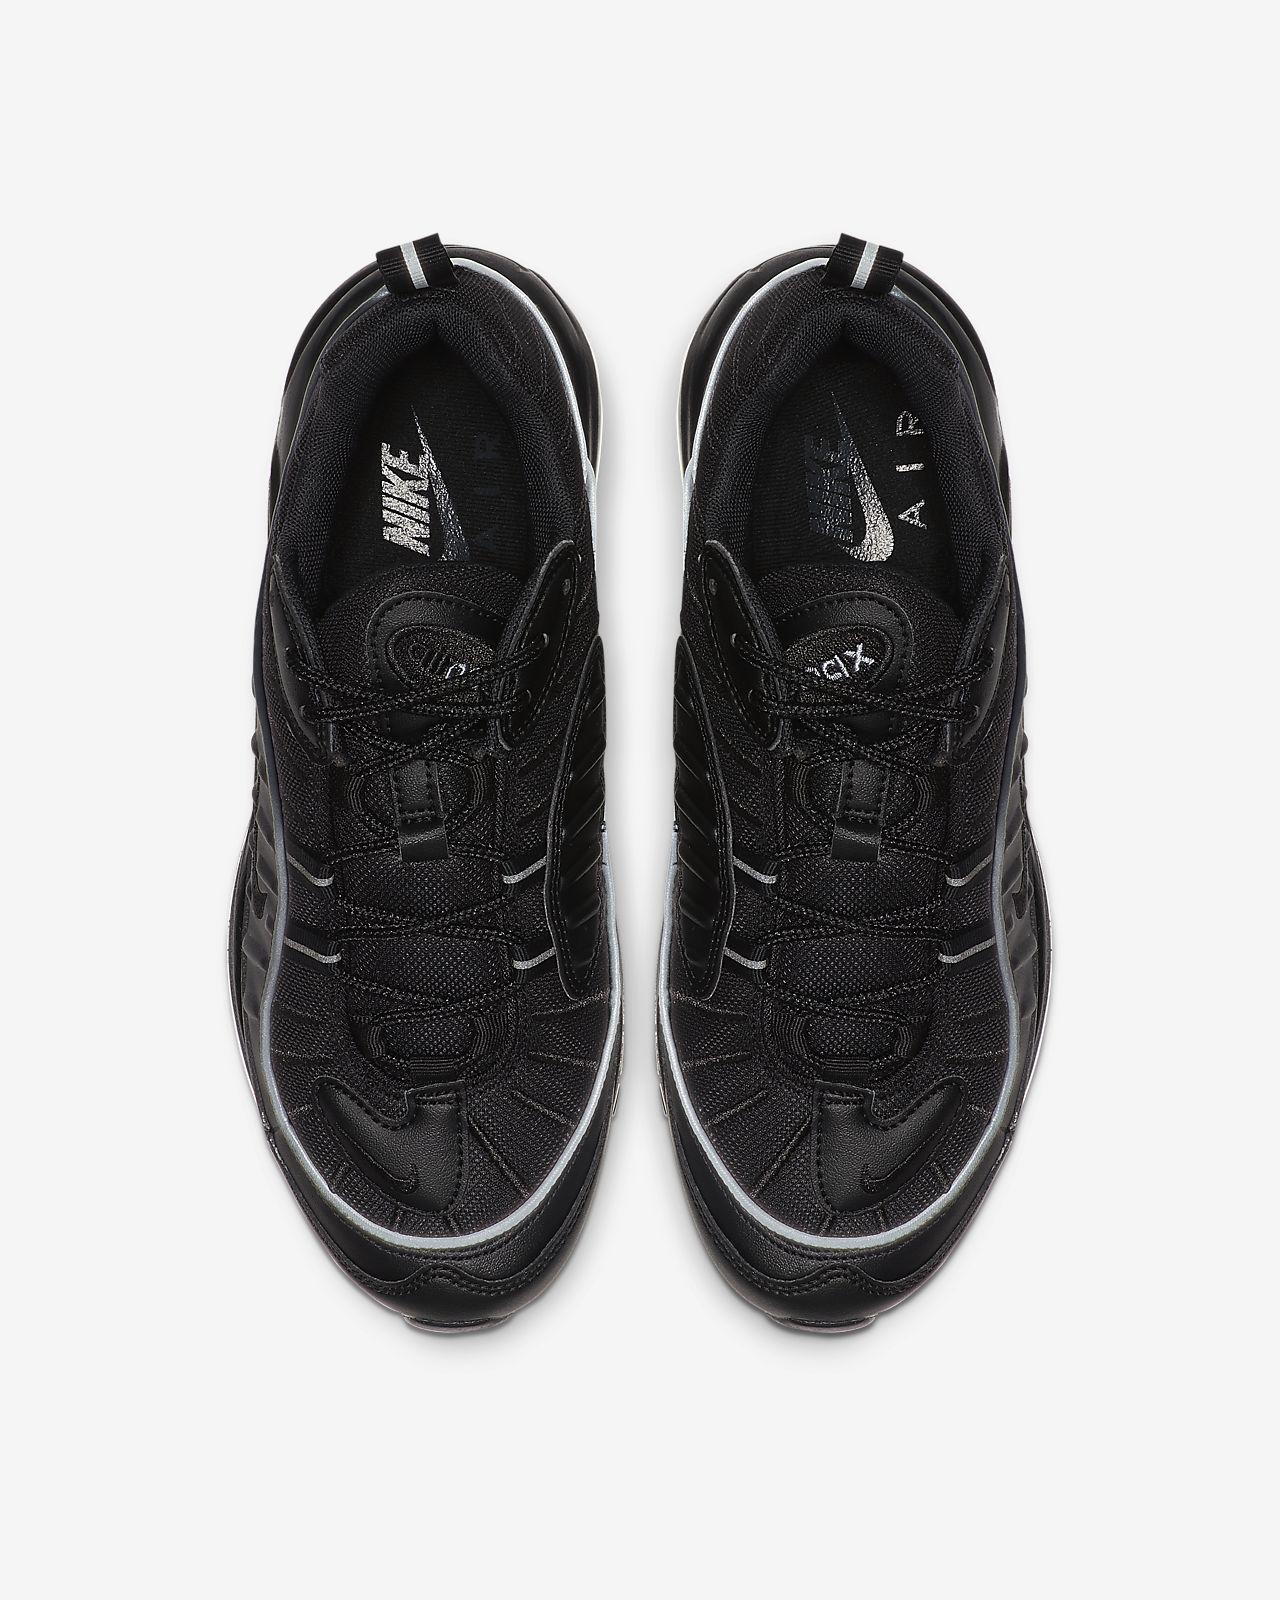 894f1ee7 Nike Air Max 98 Zapatillas - Mujer. Nike.com ES